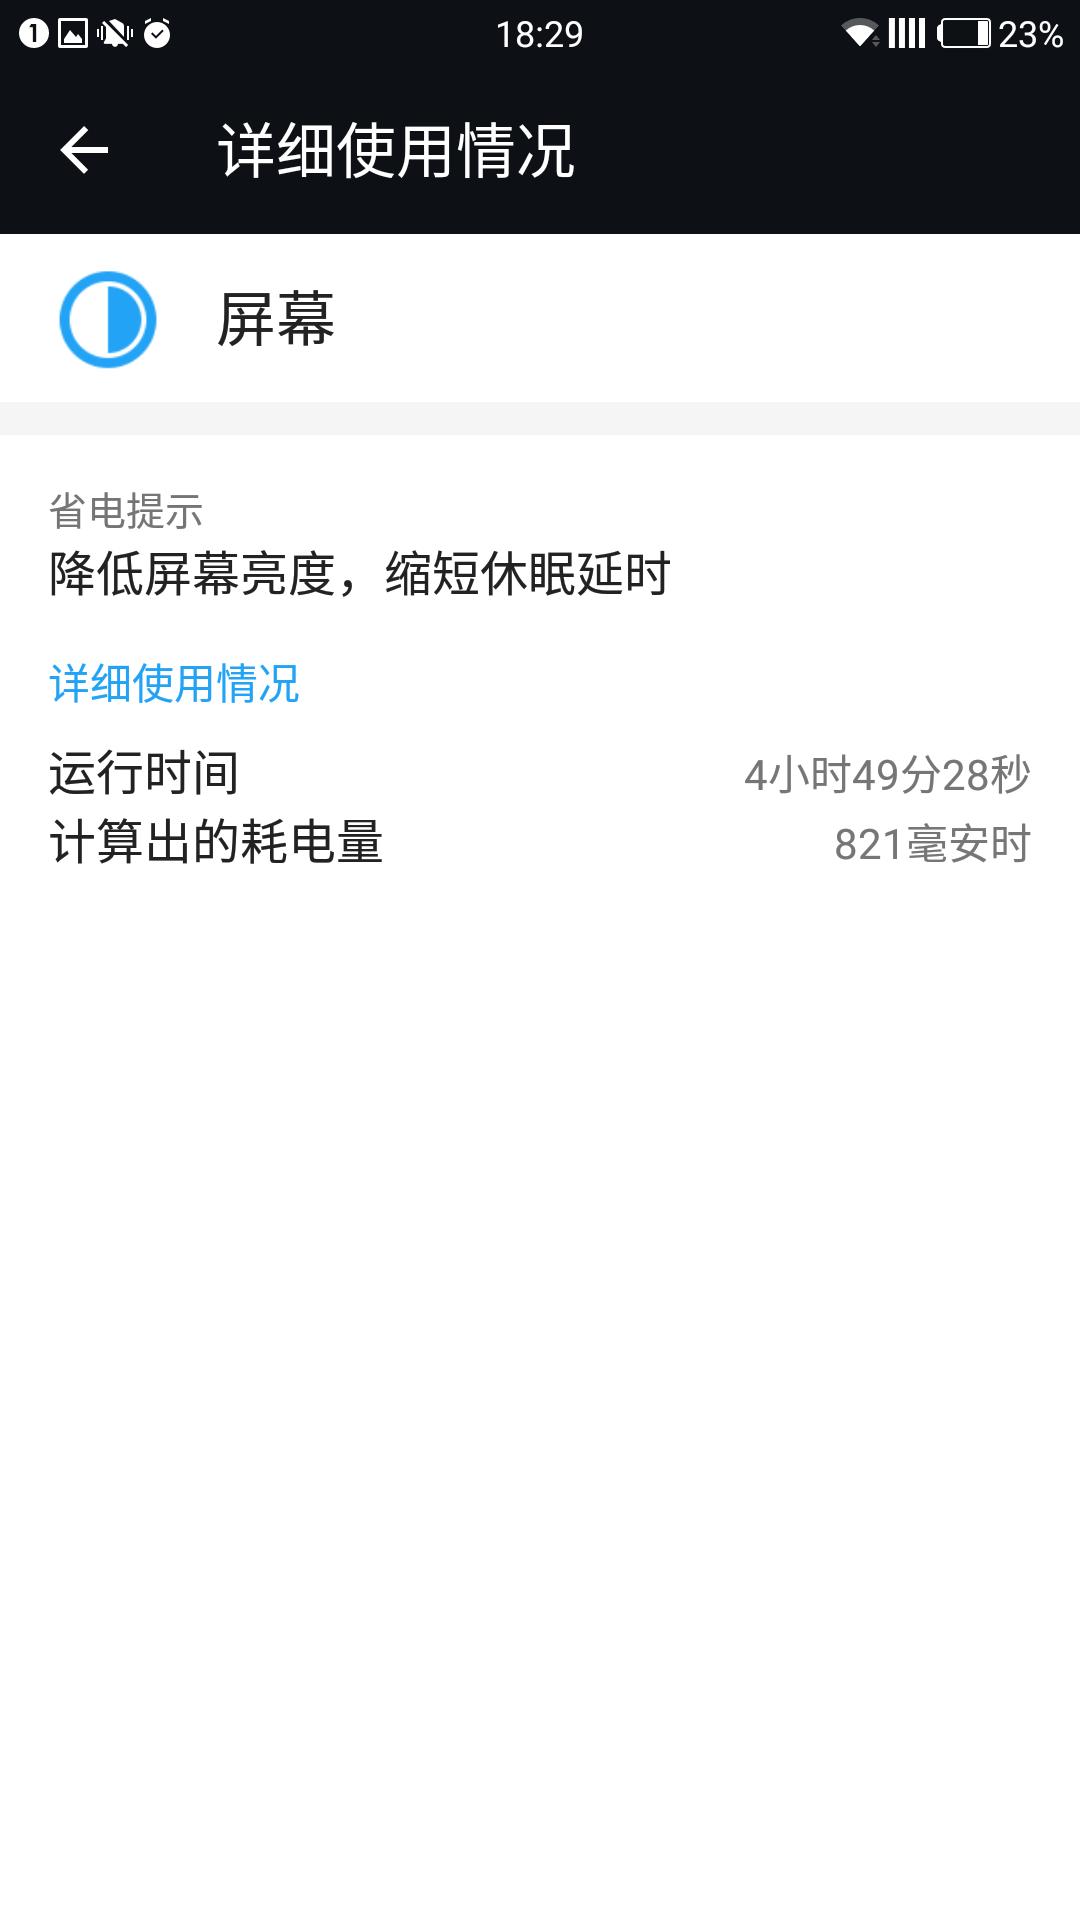 Screenshot_20160830-182905.png